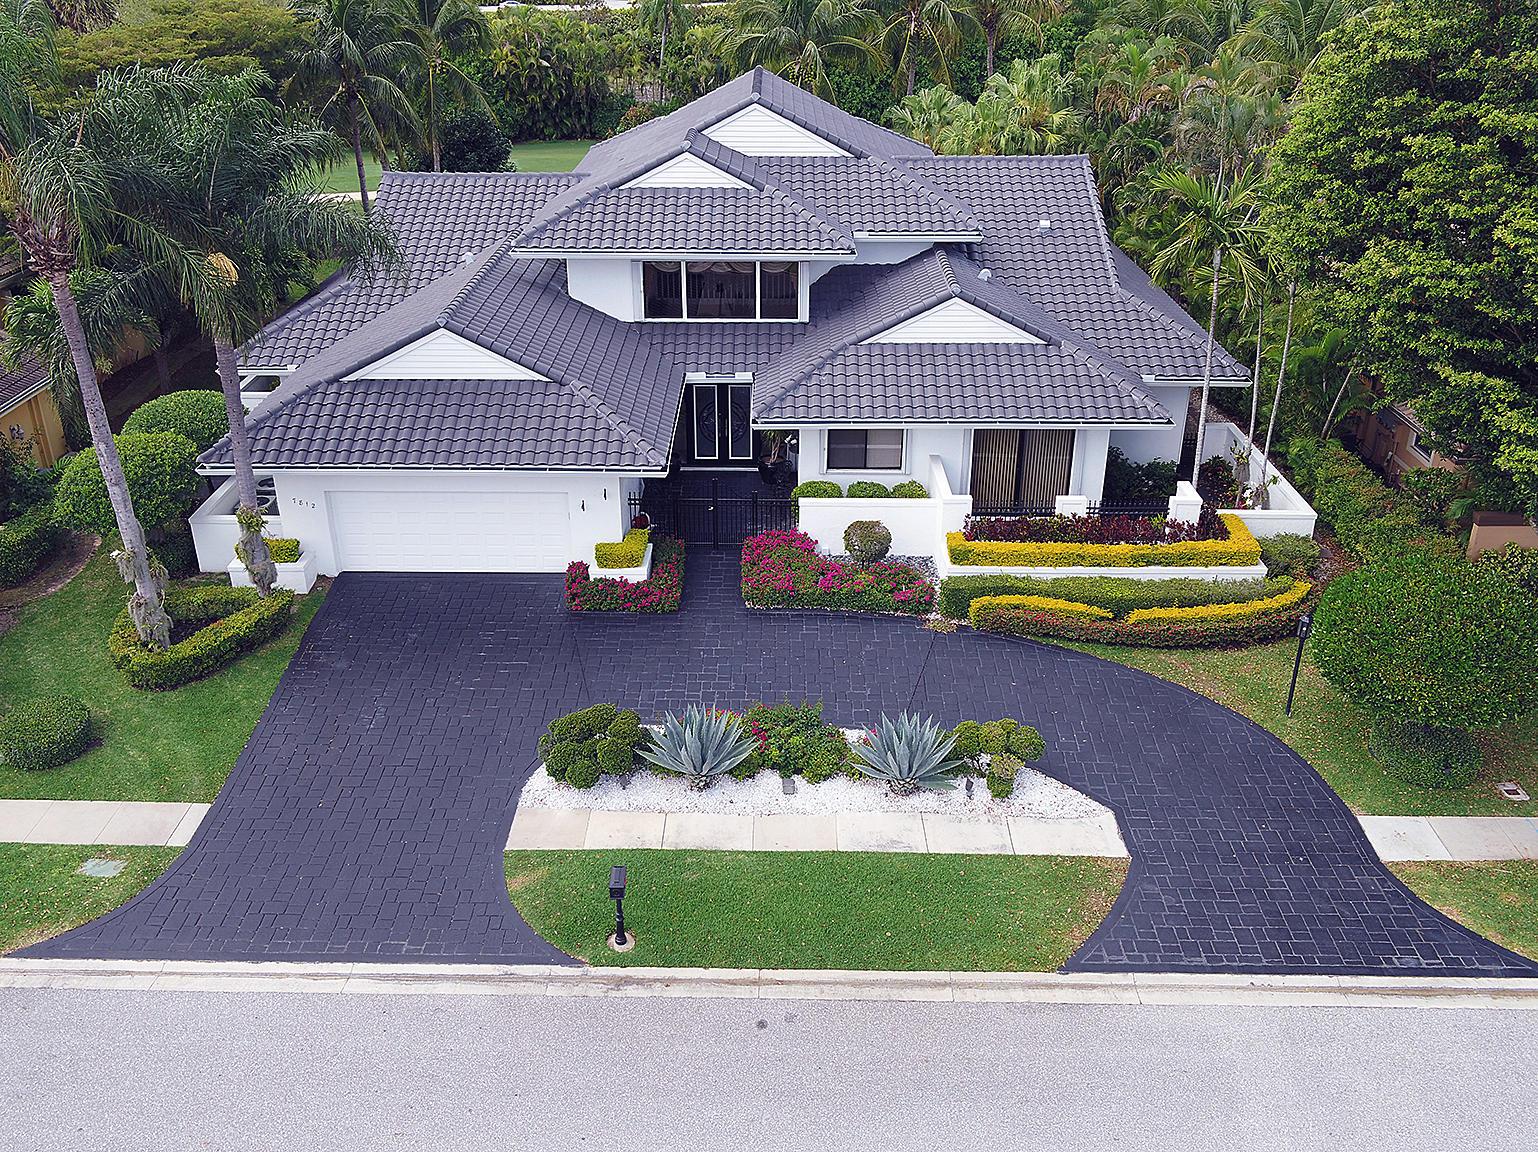 7812 Mandarin Drive  Boca Raton, FL 33433